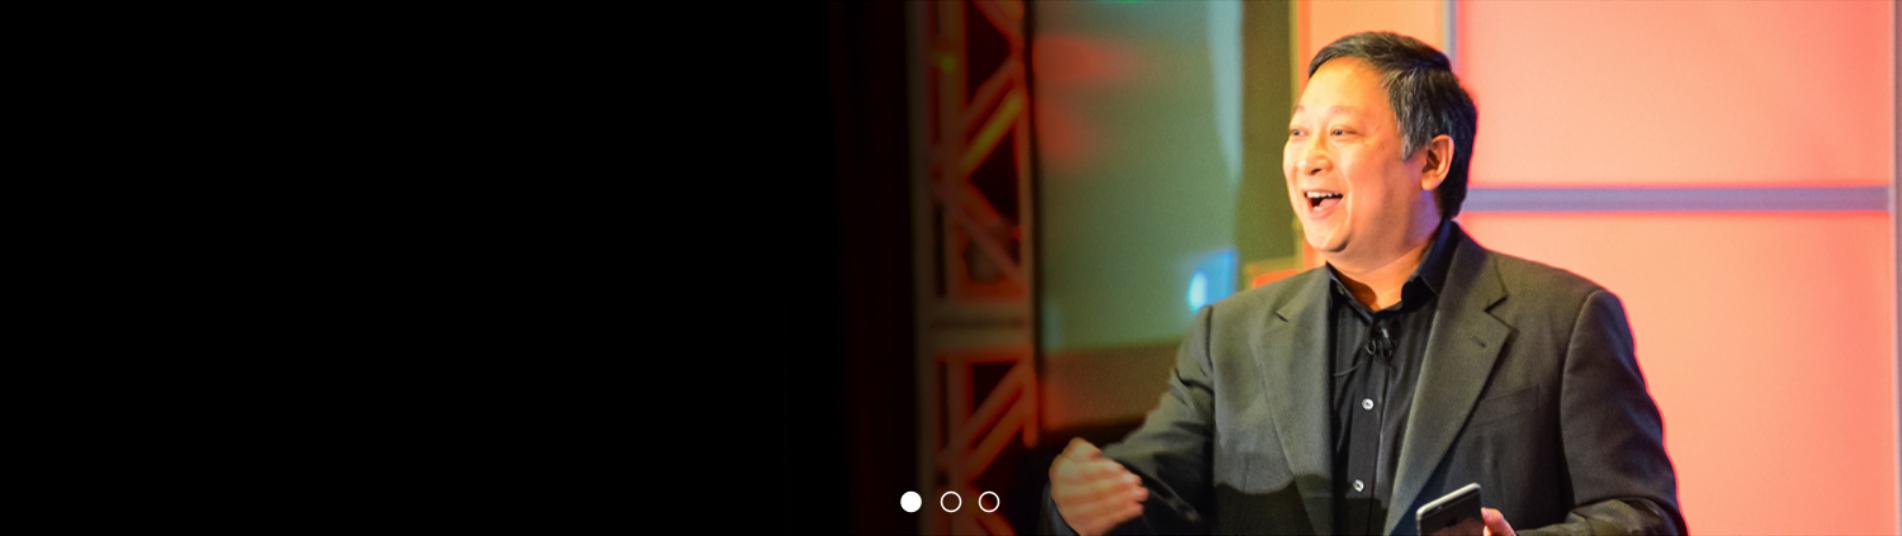 Patrick Thean - speaker, CEO of Rhythm Systems, author of Rhythm book